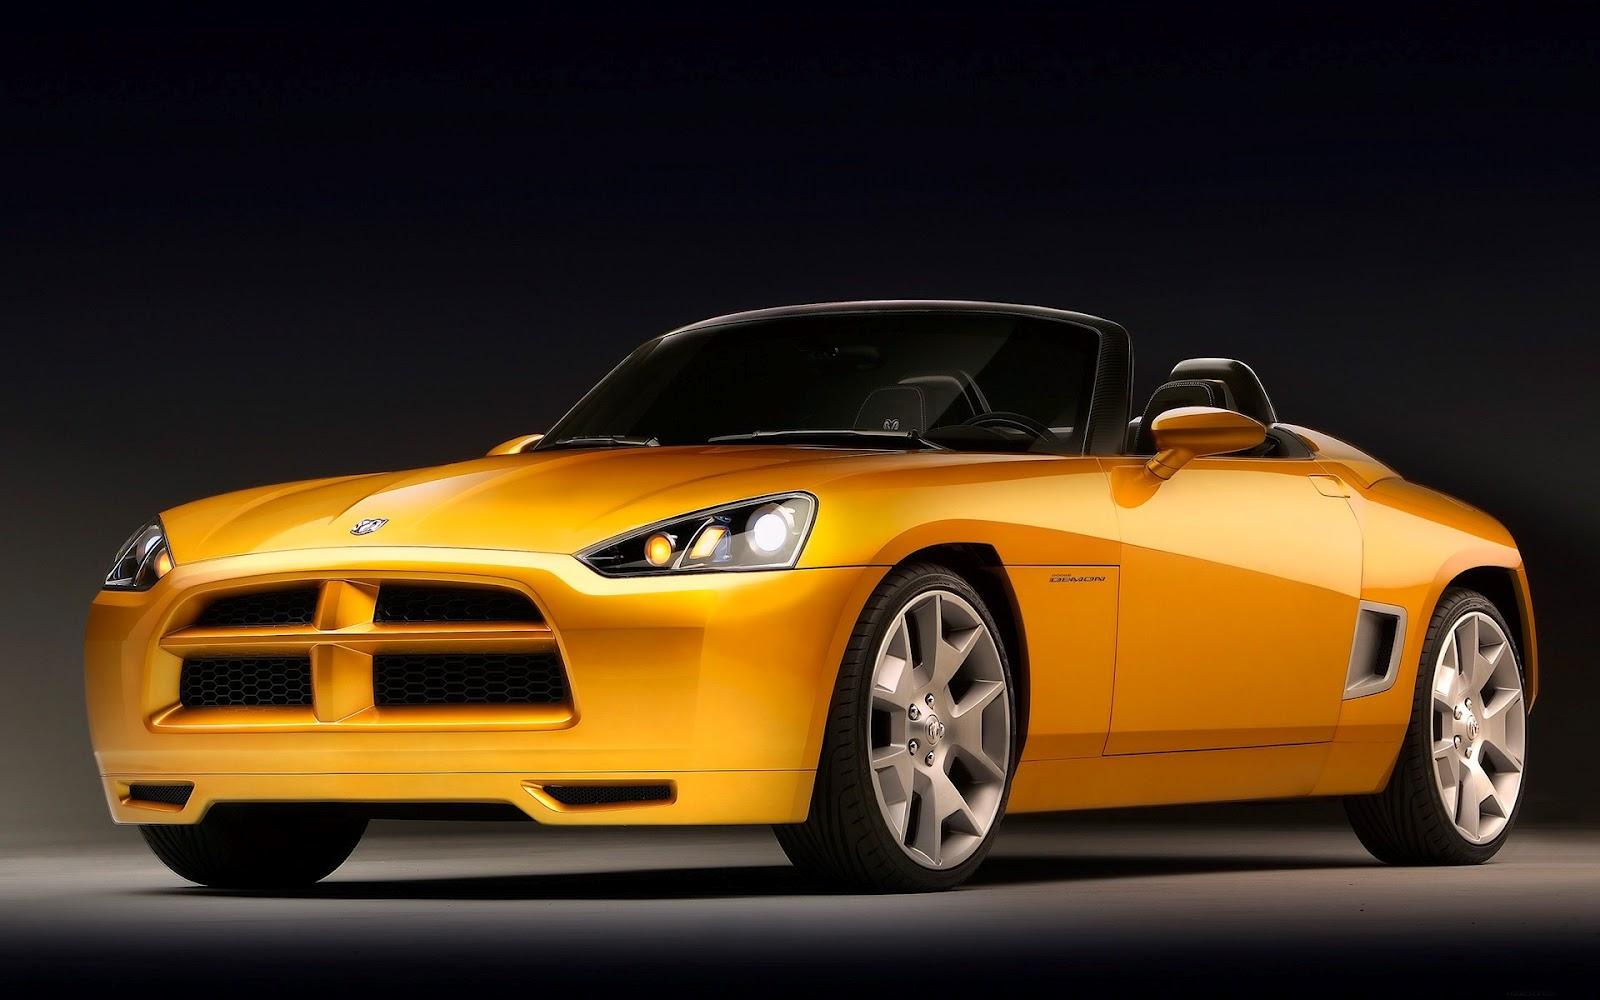 http://4.bp.blogspot.com/-X9Q-WC0QadQ/T4nQWlZya5I/AAAAAAAAAKA/hoDuGg64zus/s1600/Dodge+Demon+Roadster+Concept+2007+01+1920X1200+Deluxe+Car+Wallpaper.jpg